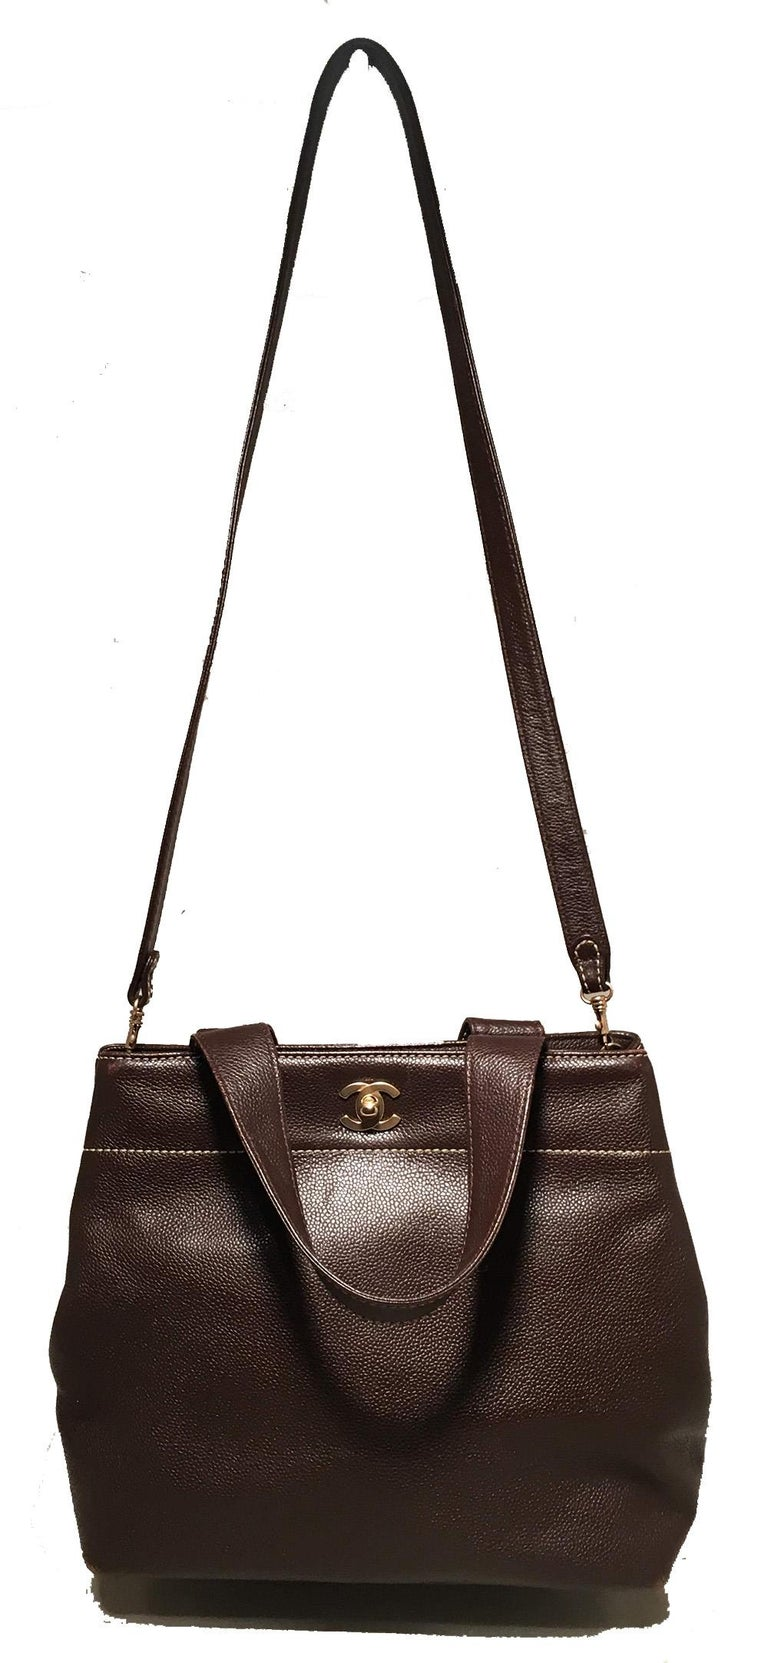 Chanel Dark Brown Caviar Top Handle Shoulder Bag Tote For Sale 7